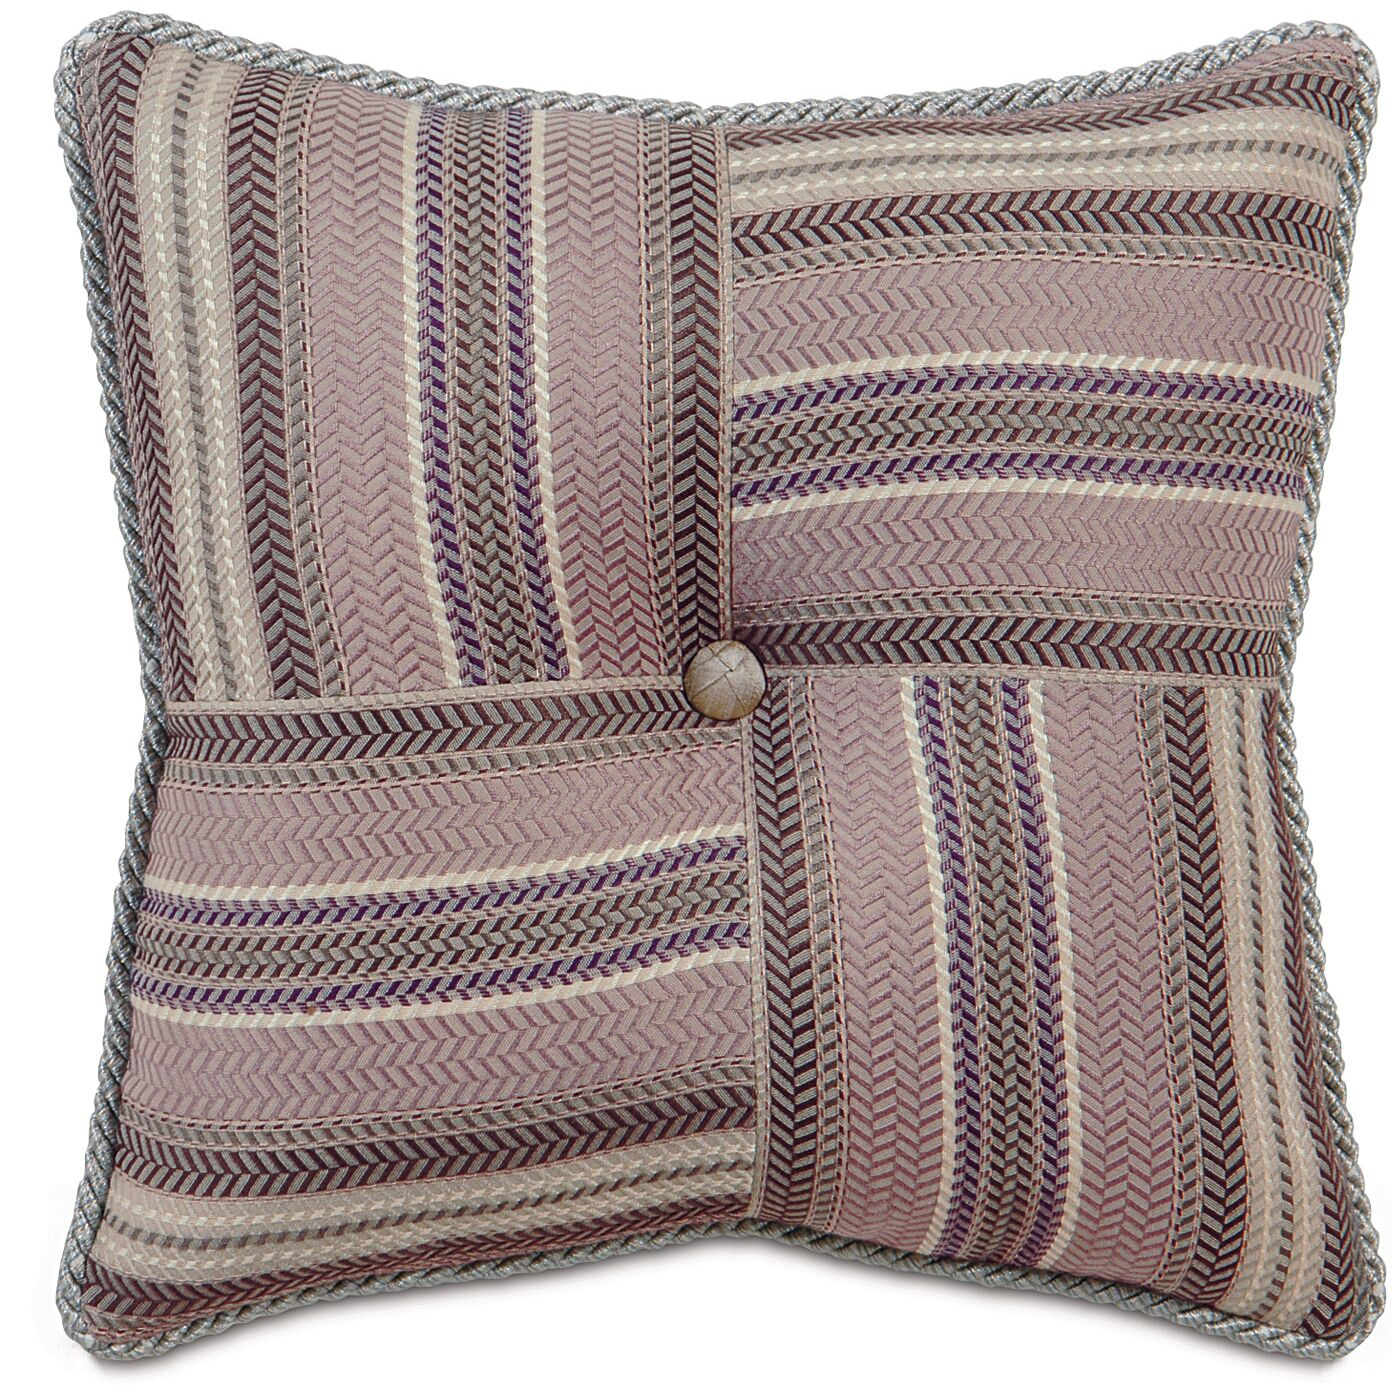 Mica Caffrey Tufted Throw Pillow